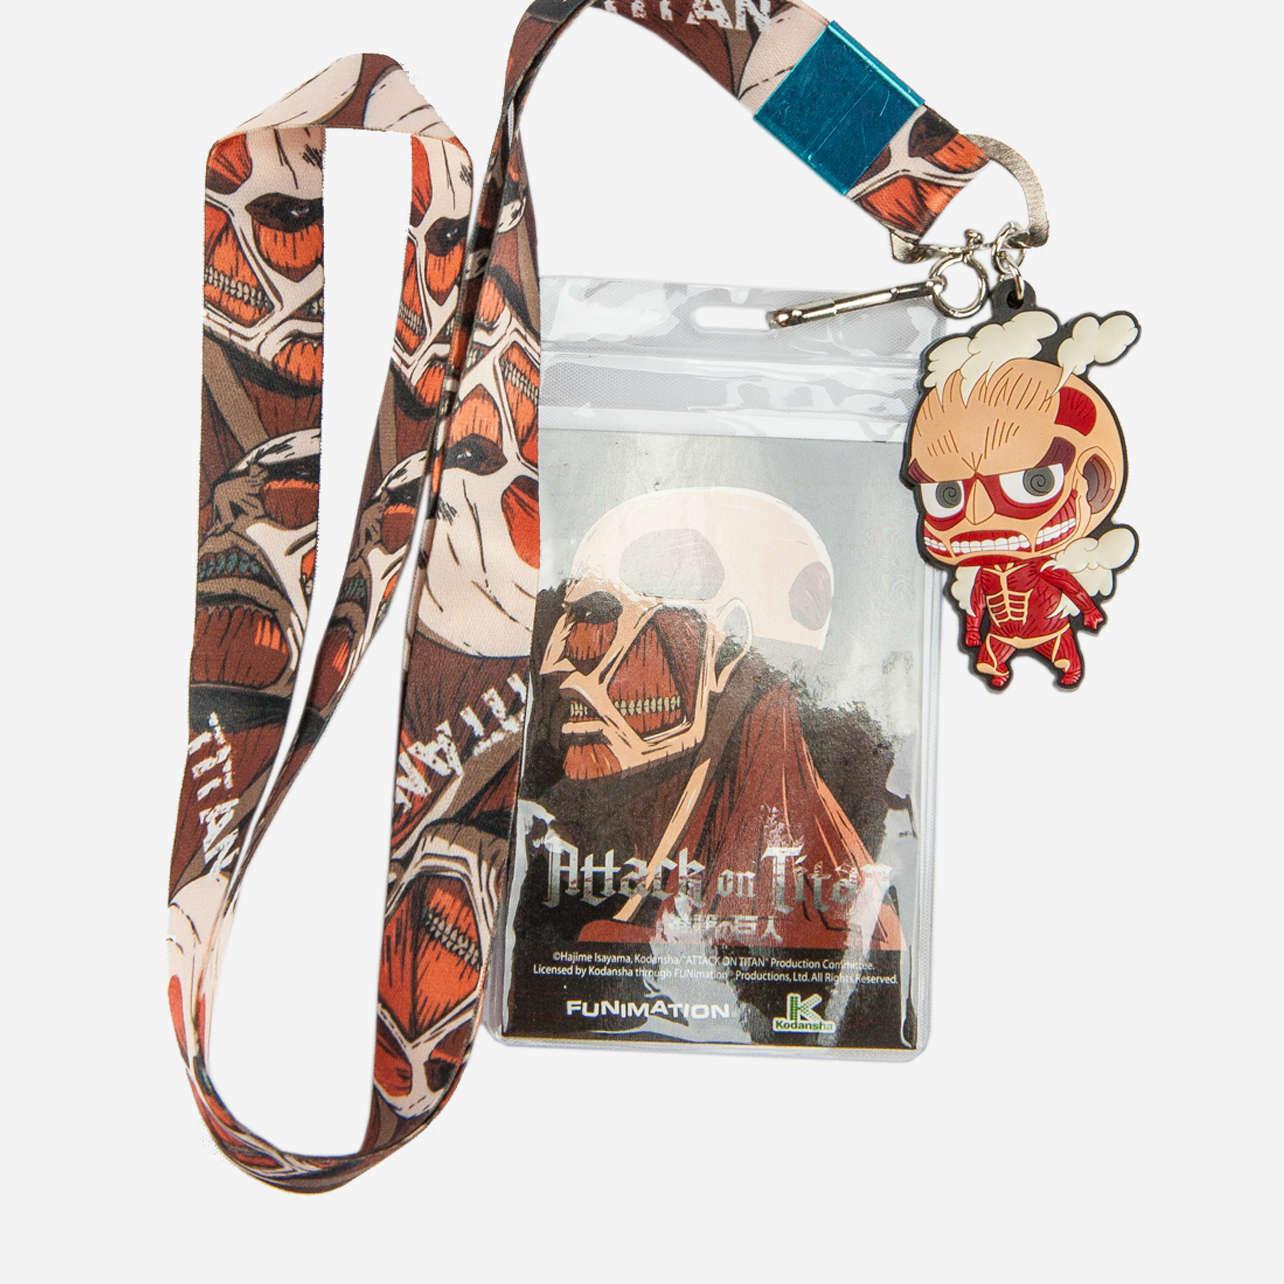 Titan Lanyard accessories